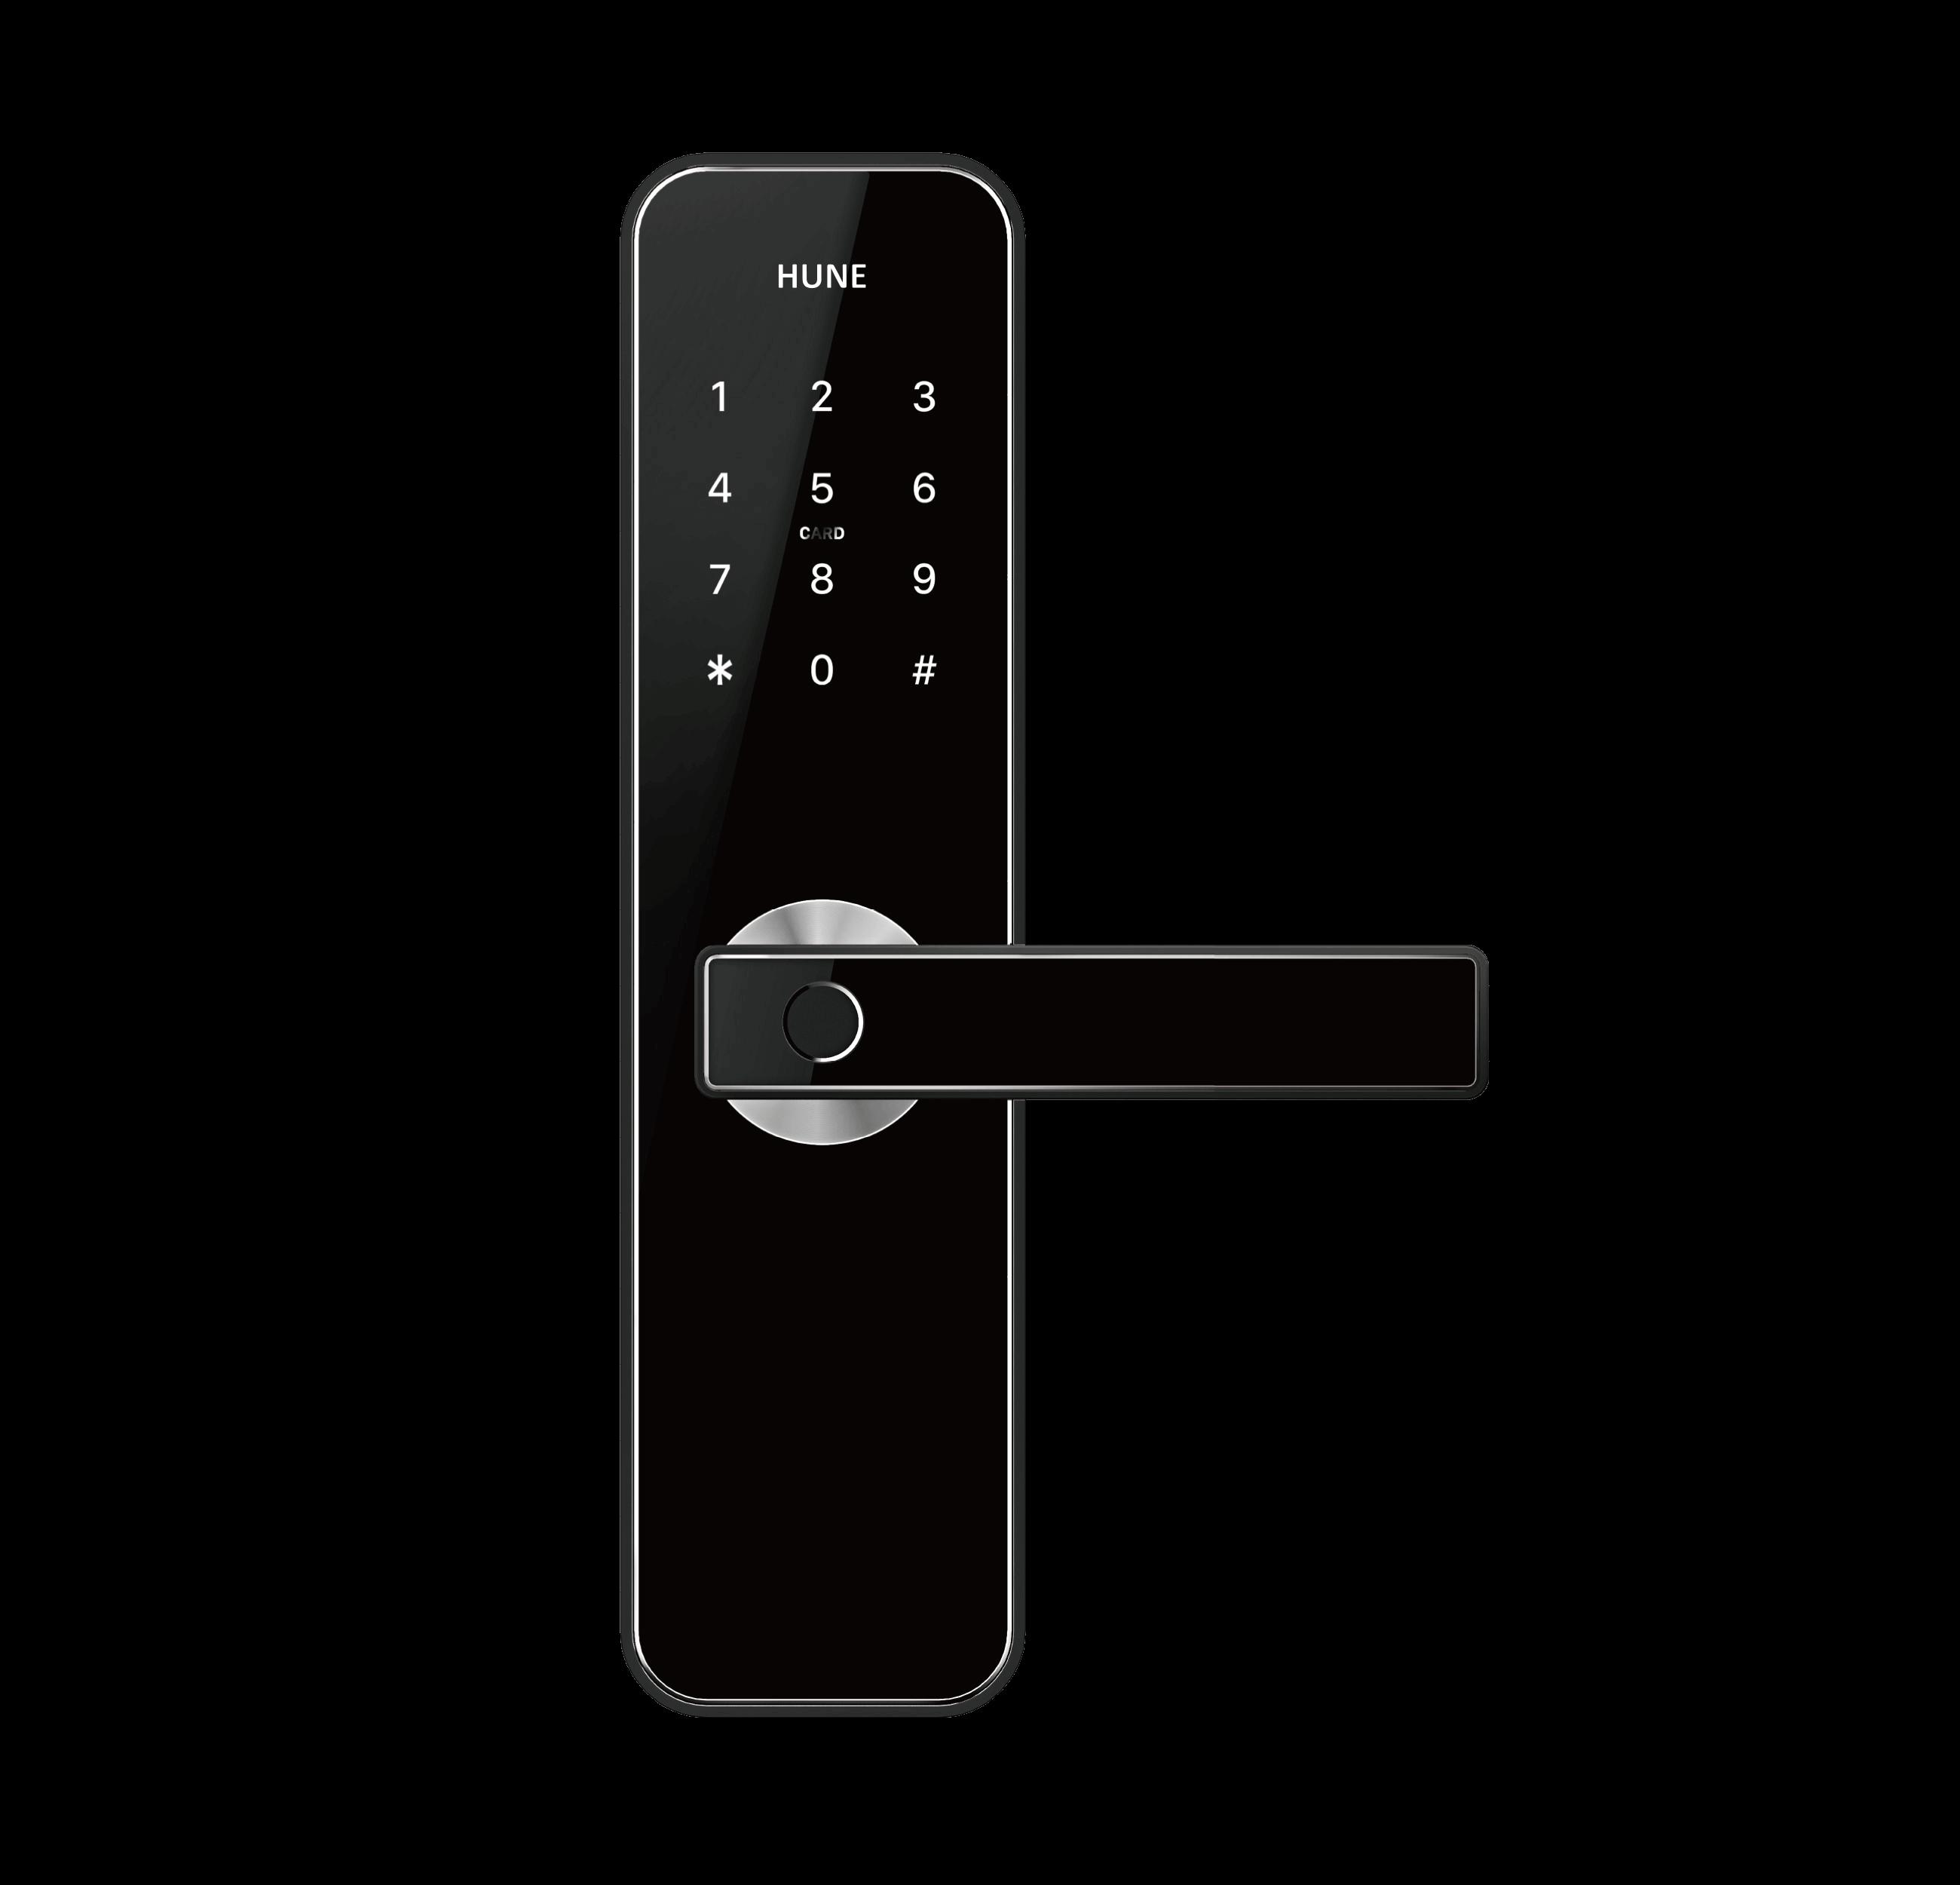 Hune H270 digital door lock for condo, apartment, residential, Airbnb etc.